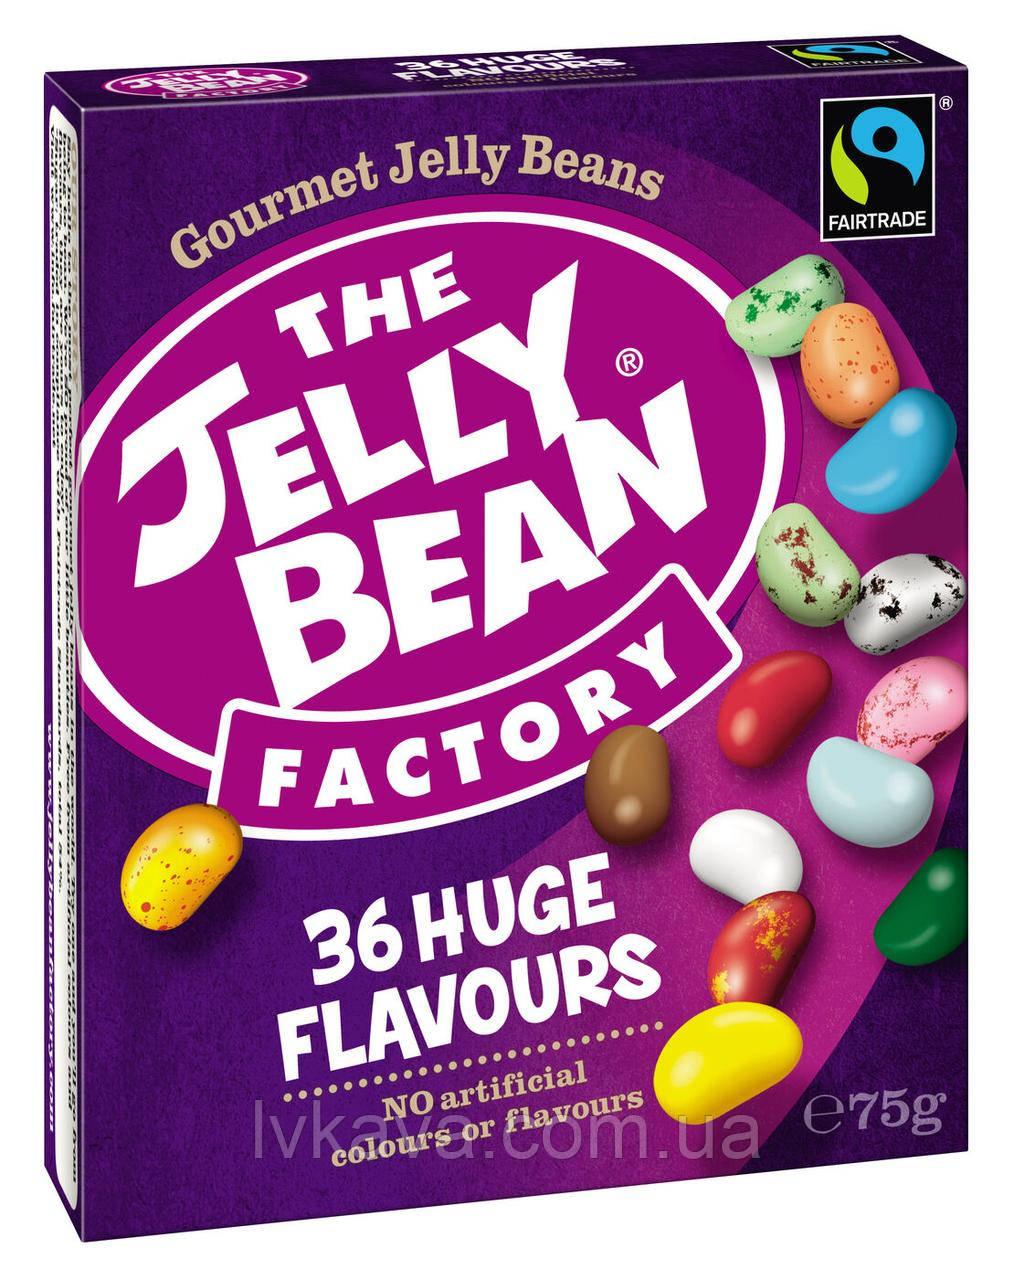 Желейные конфеты The Jelly Bean factory 36 huge flavours, 75 гр